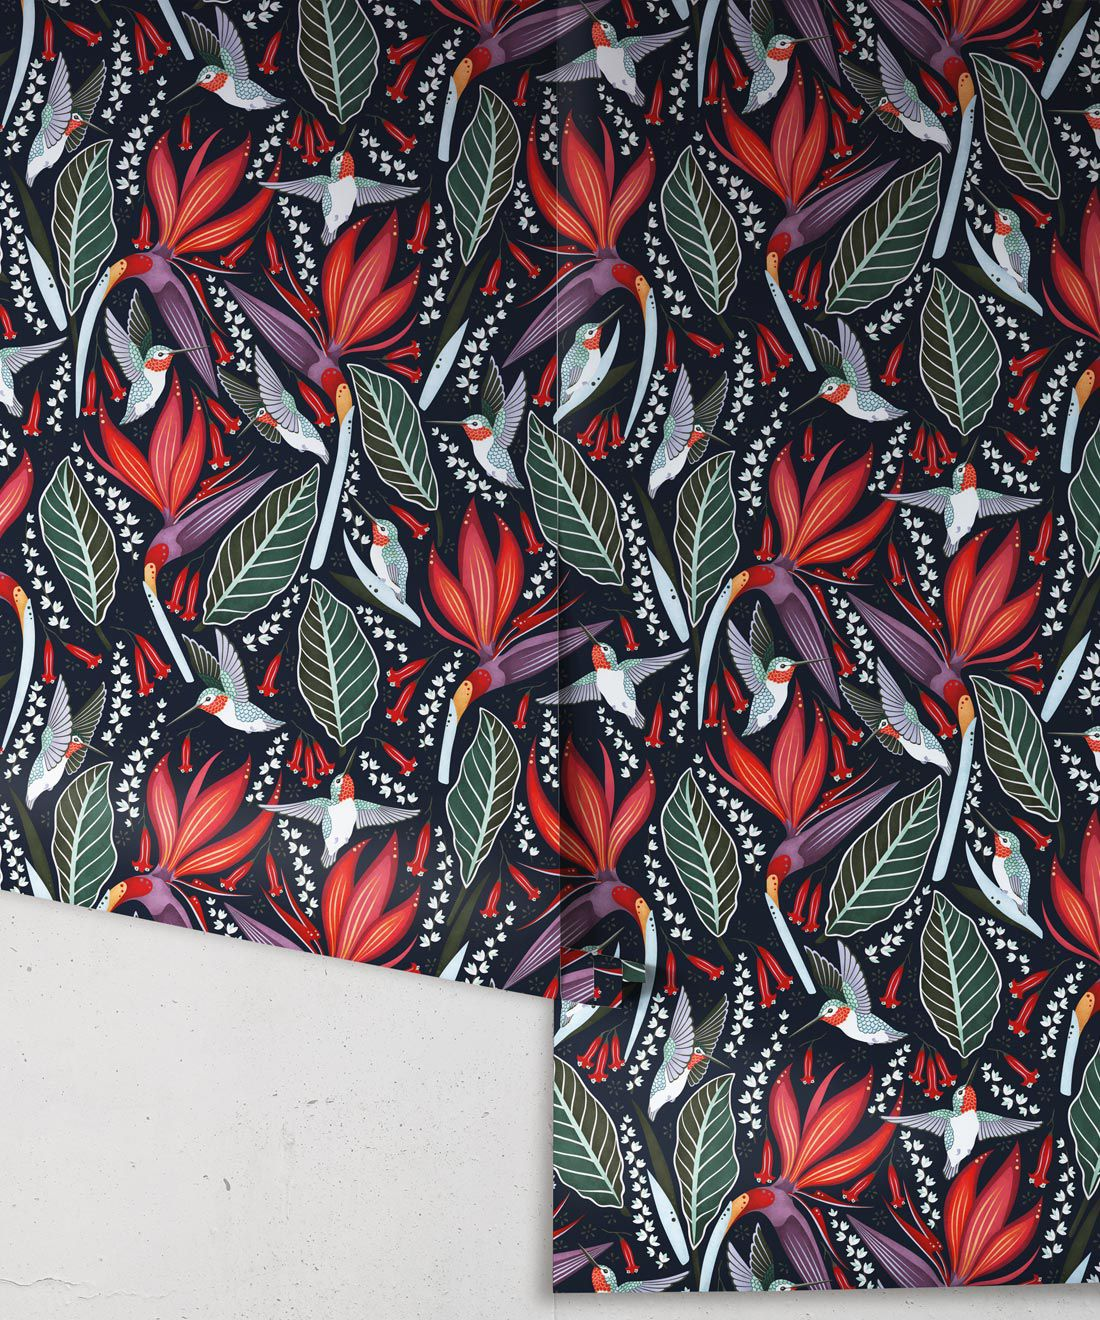 Hummingbird Wallpaper • Birds Of Paradise Flower • Bird Wallpaper • Red Flowers • Black Cherry • Wallpaper Drops